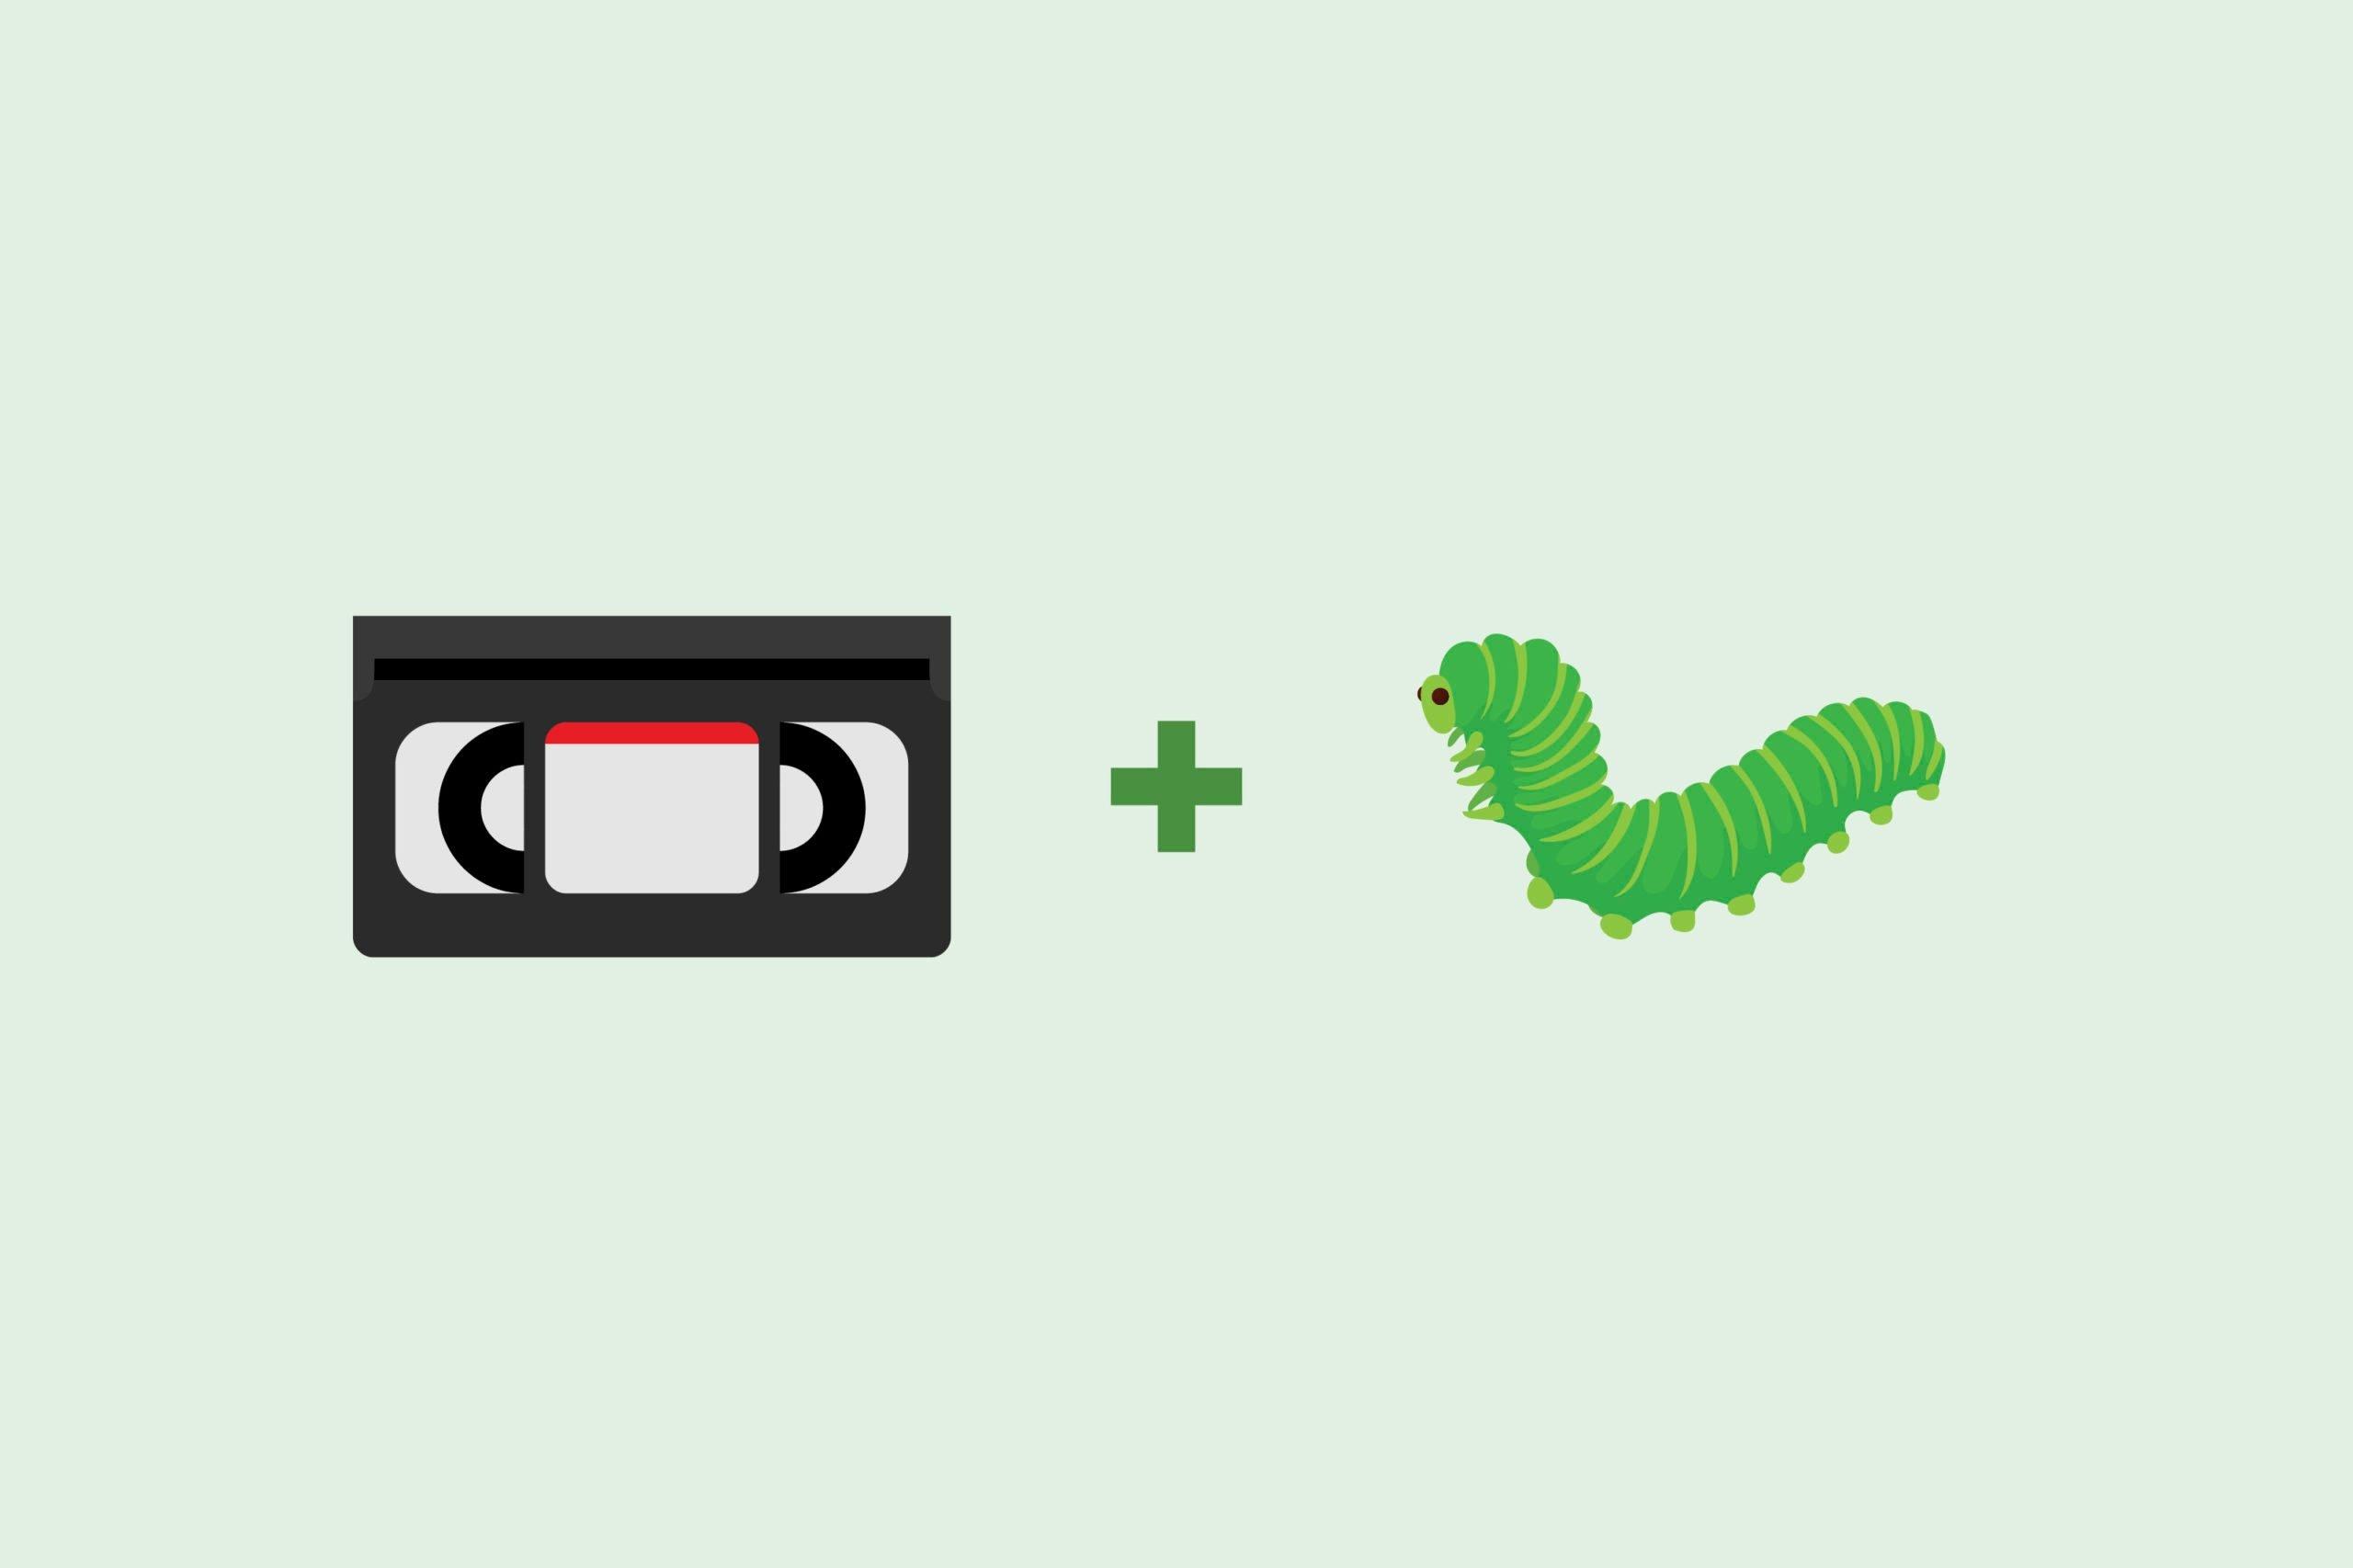 Cassette emoji + caterpillar emoji (worm)